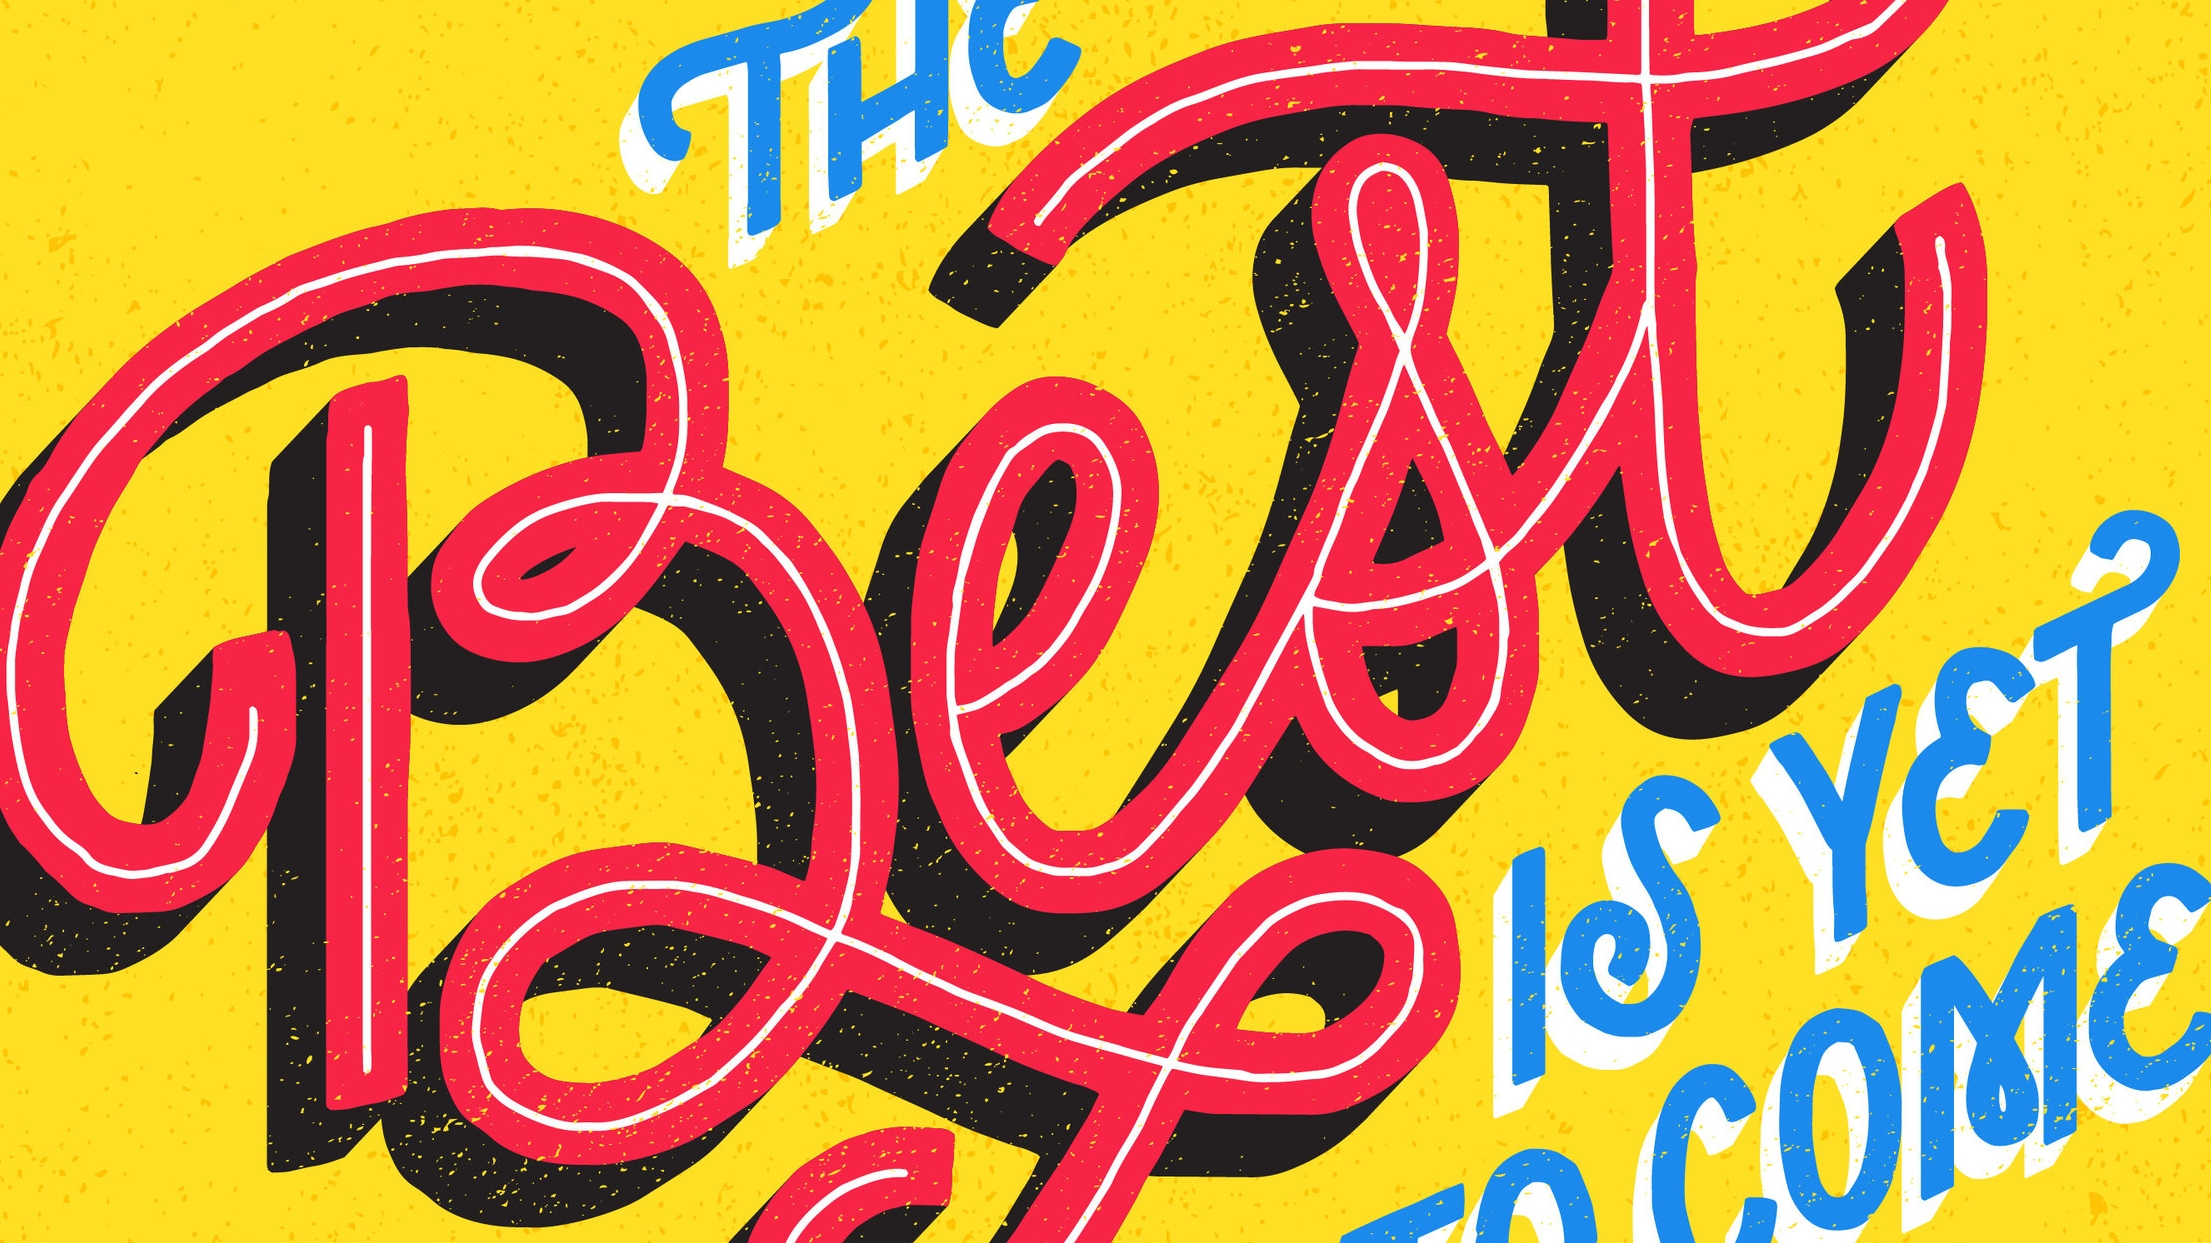 TheBest-02.jpg